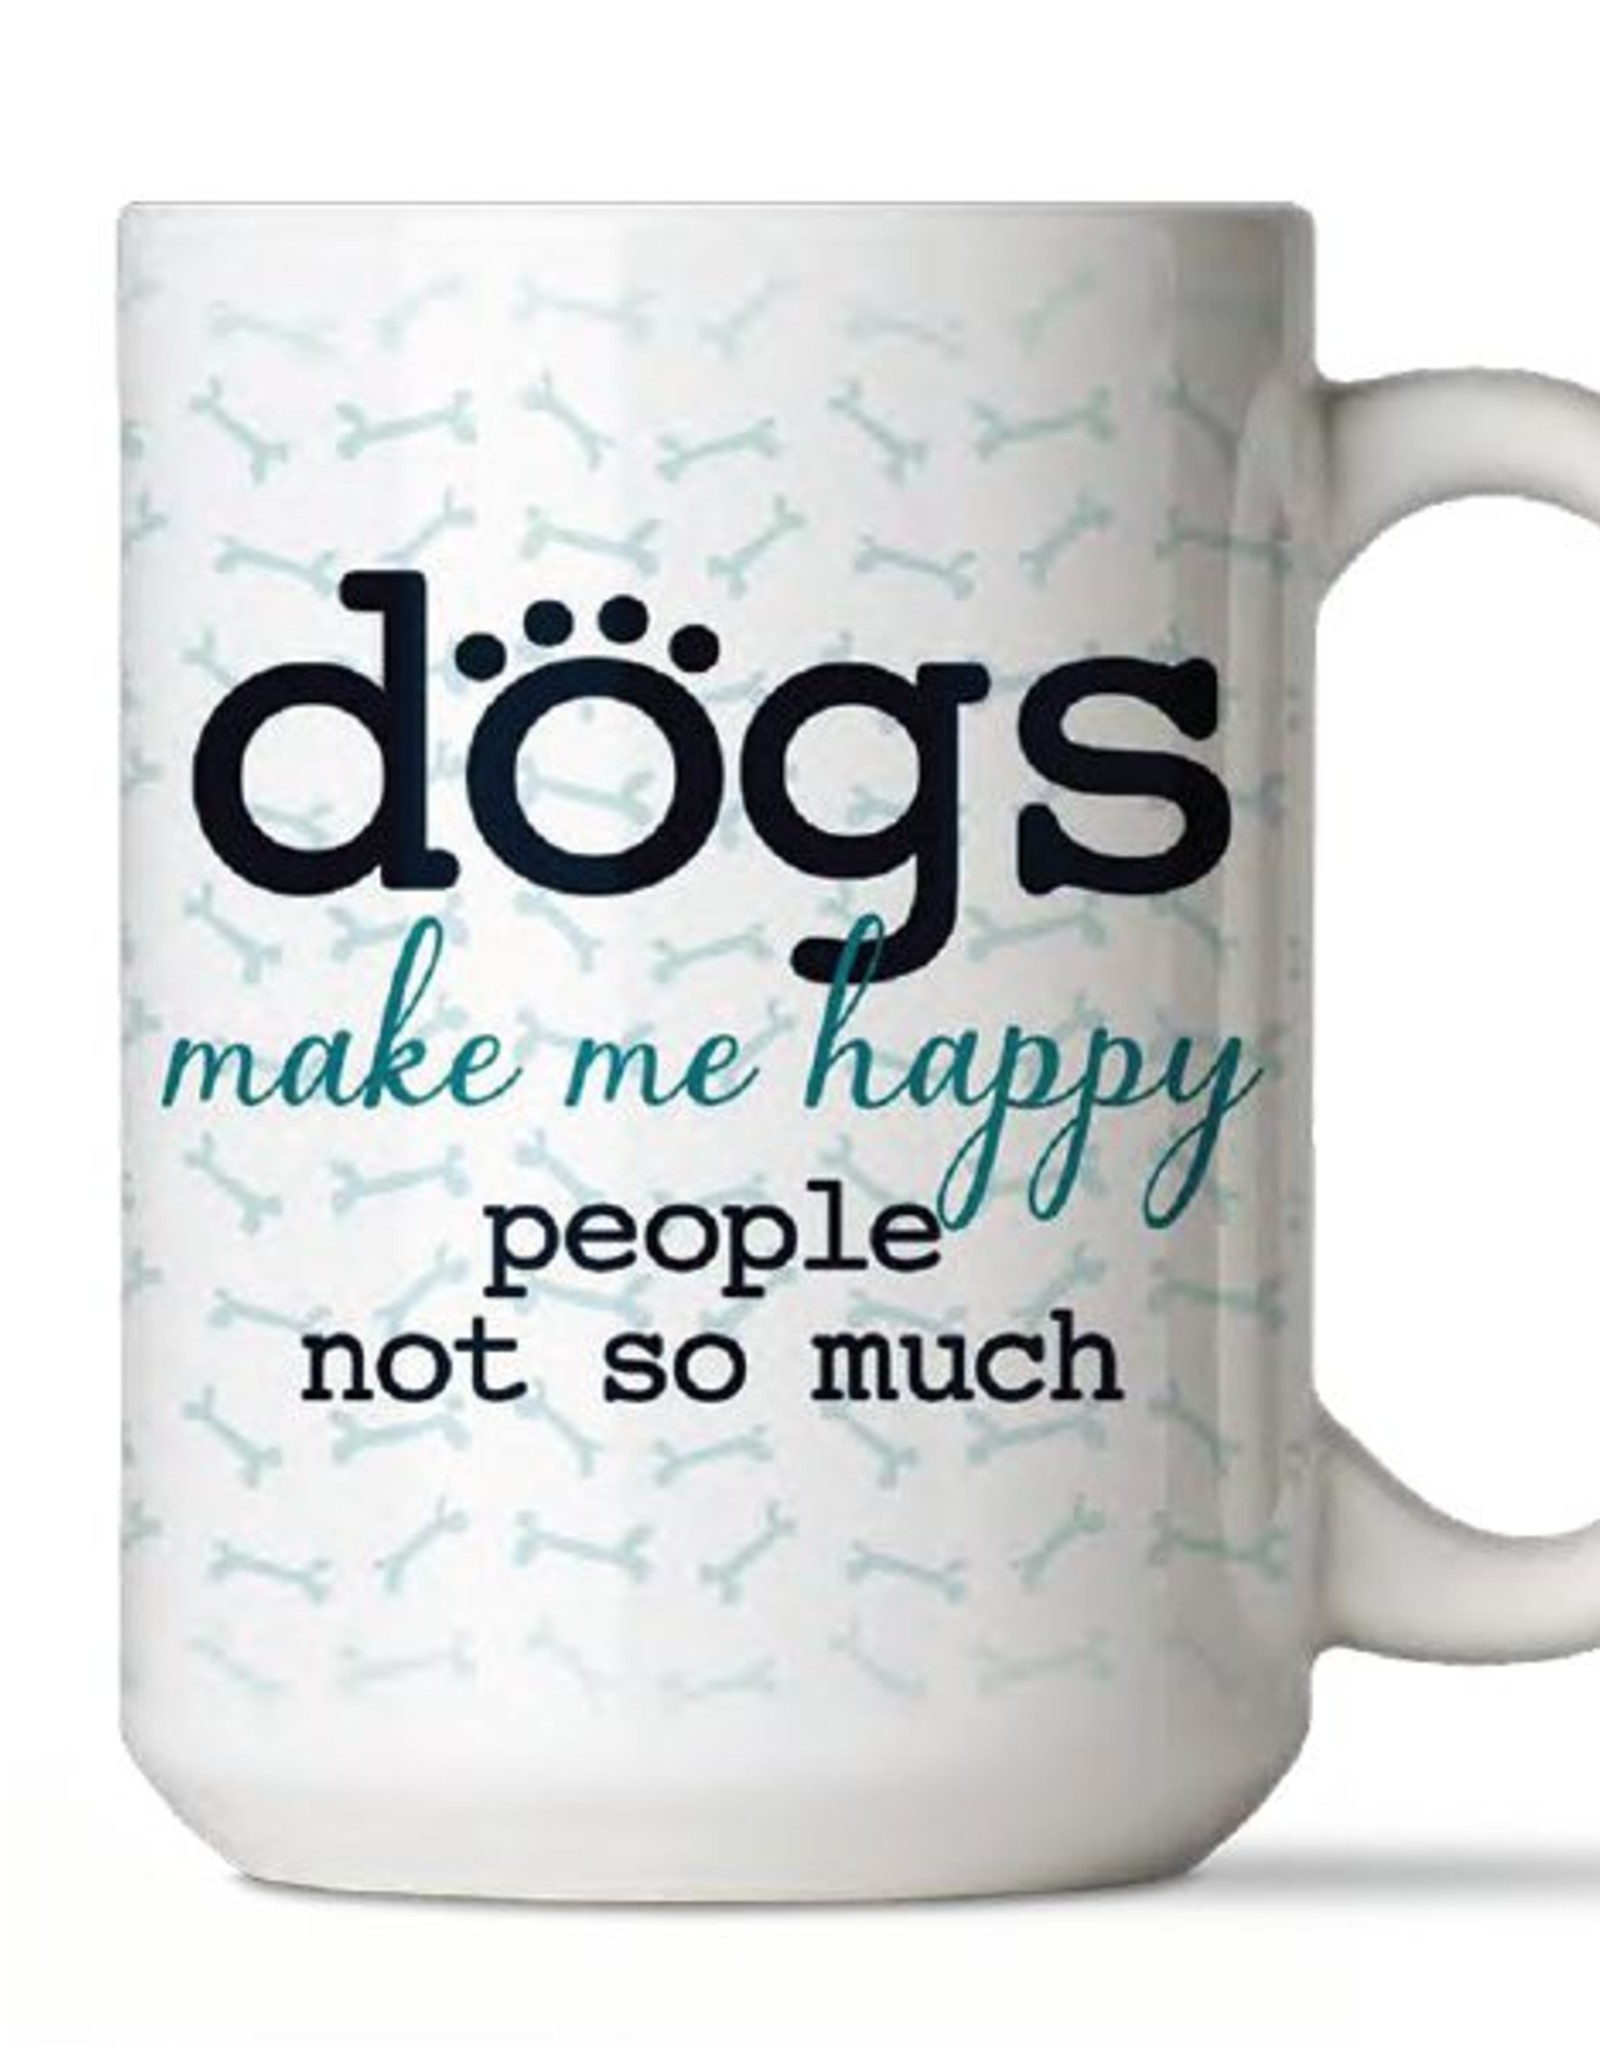 Dog Speak Dog Speak Big Coffee Mug 15oz - Dogs Make Me Happy, People Not So Much